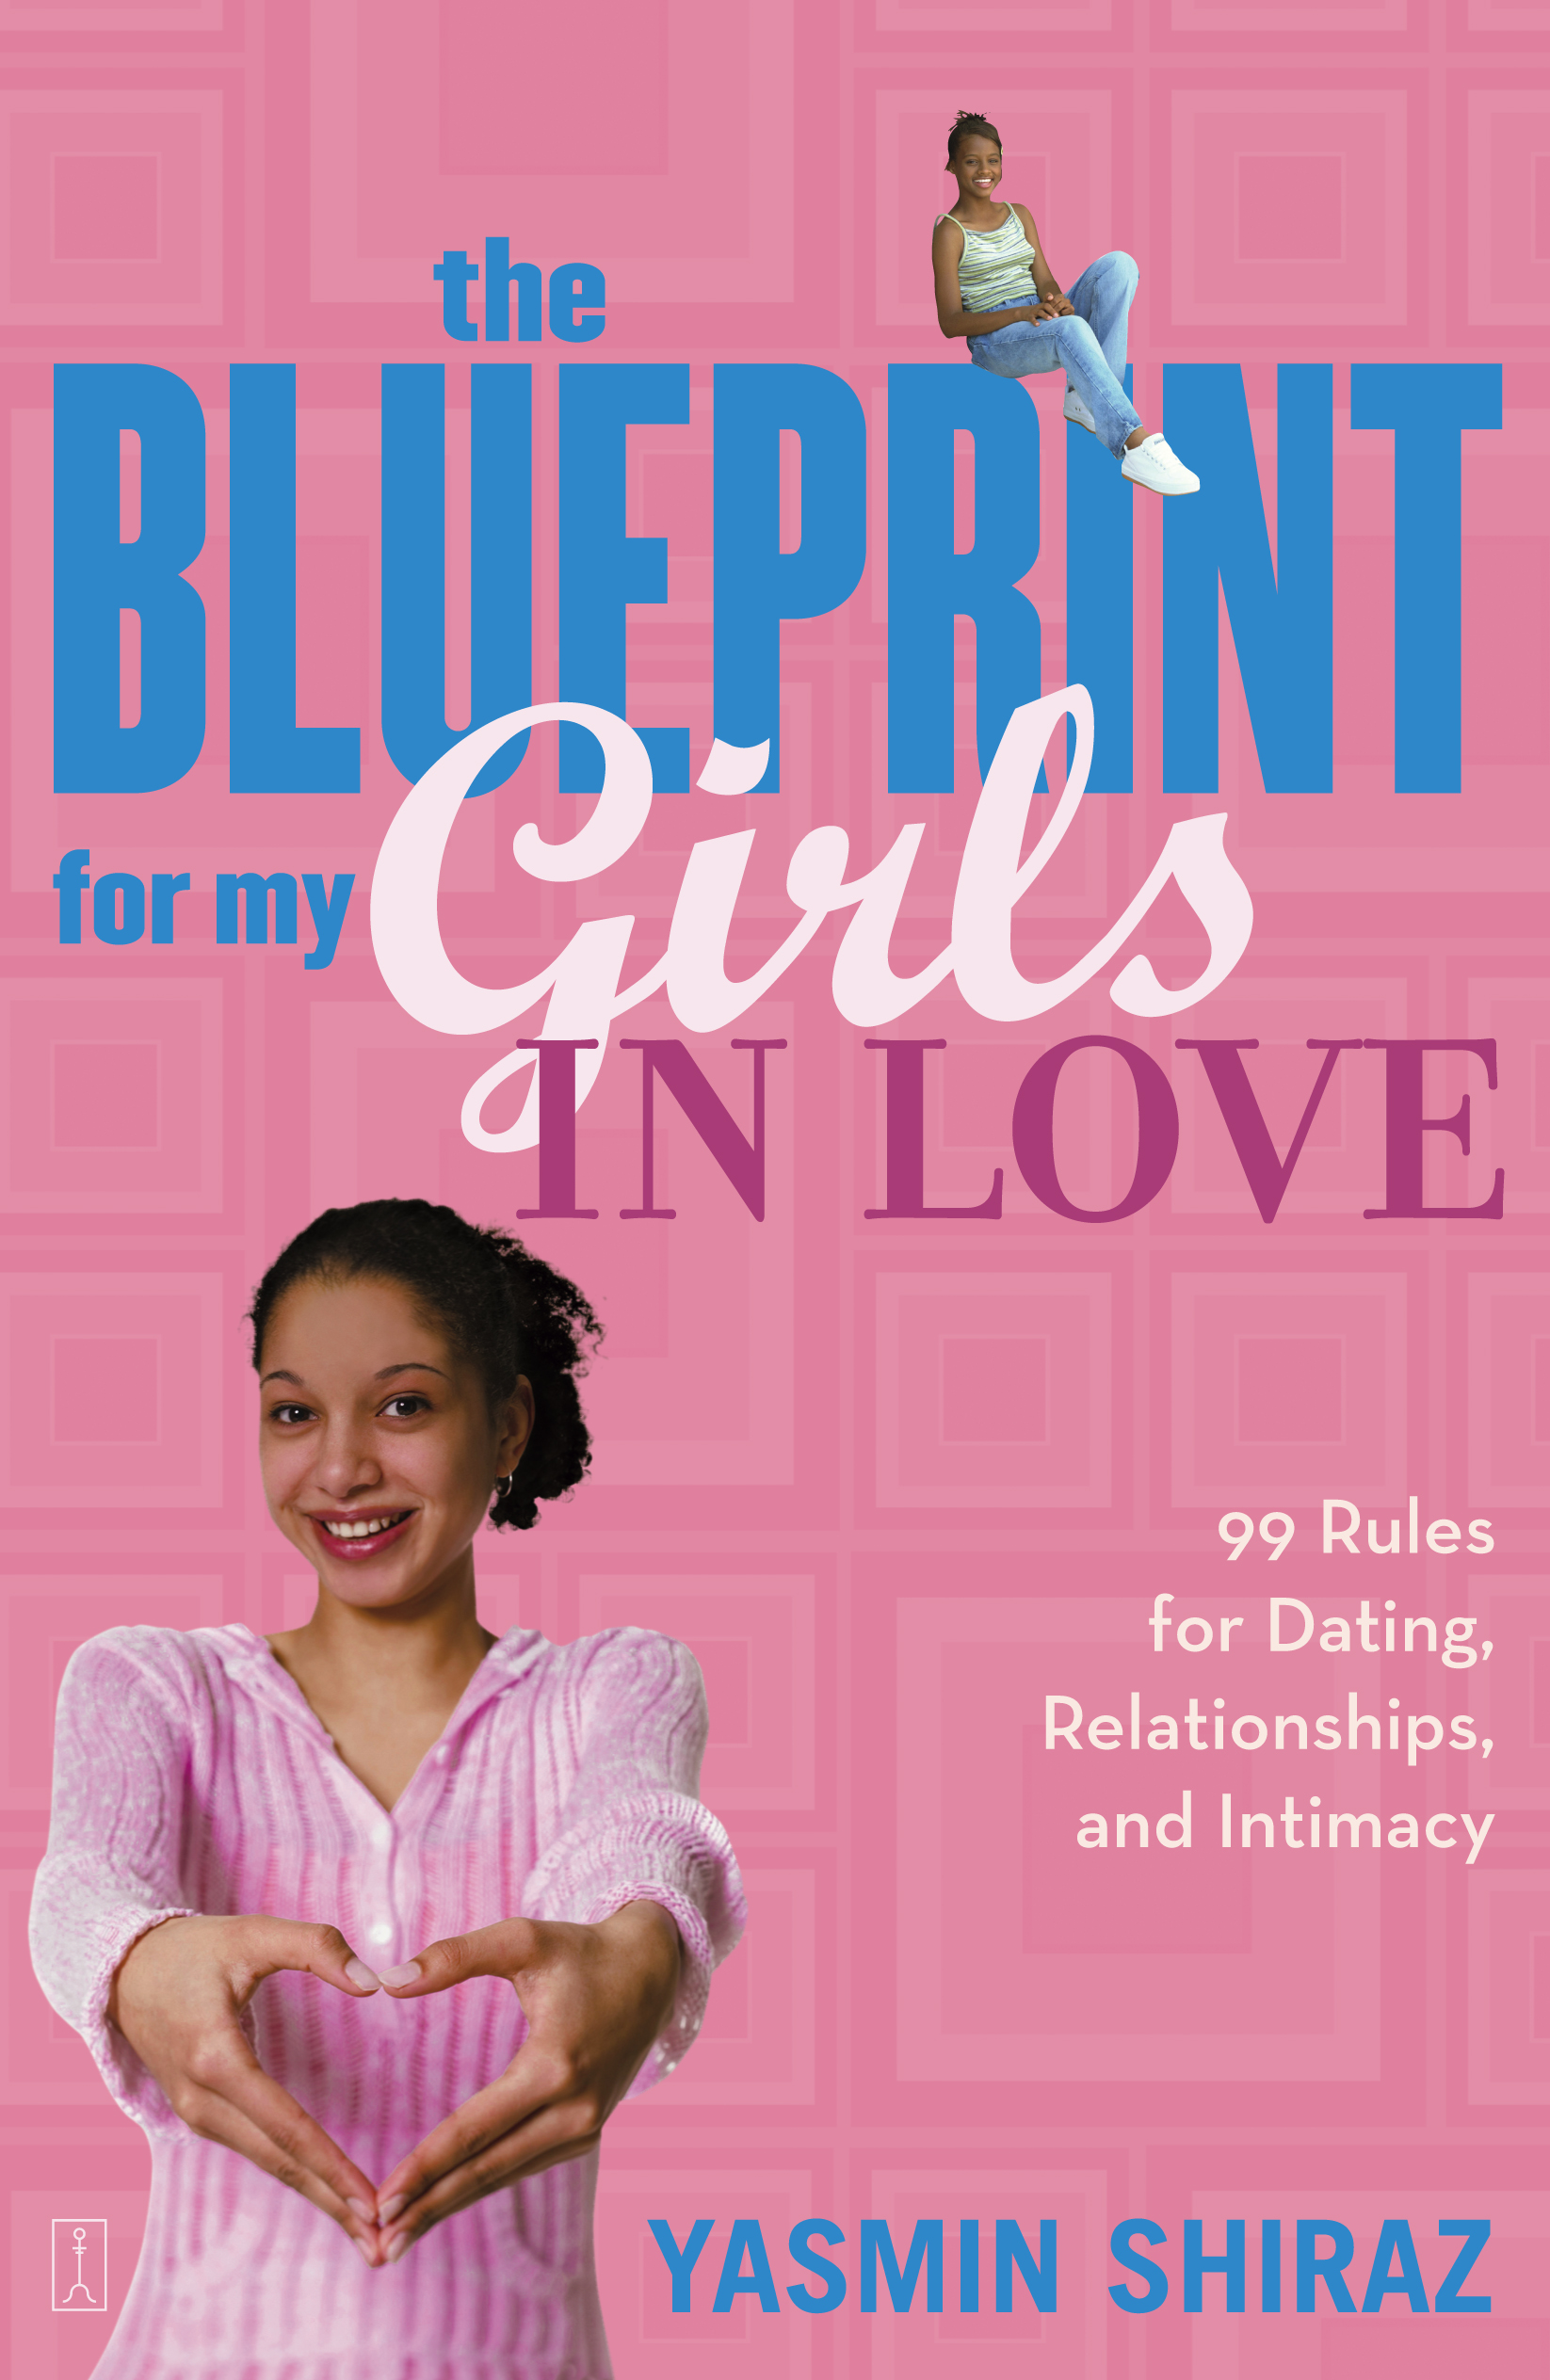 The blueprint for my girls in love book by yasmin shiraz cvr9780743270960 9780743270960 hr malvernweather Images